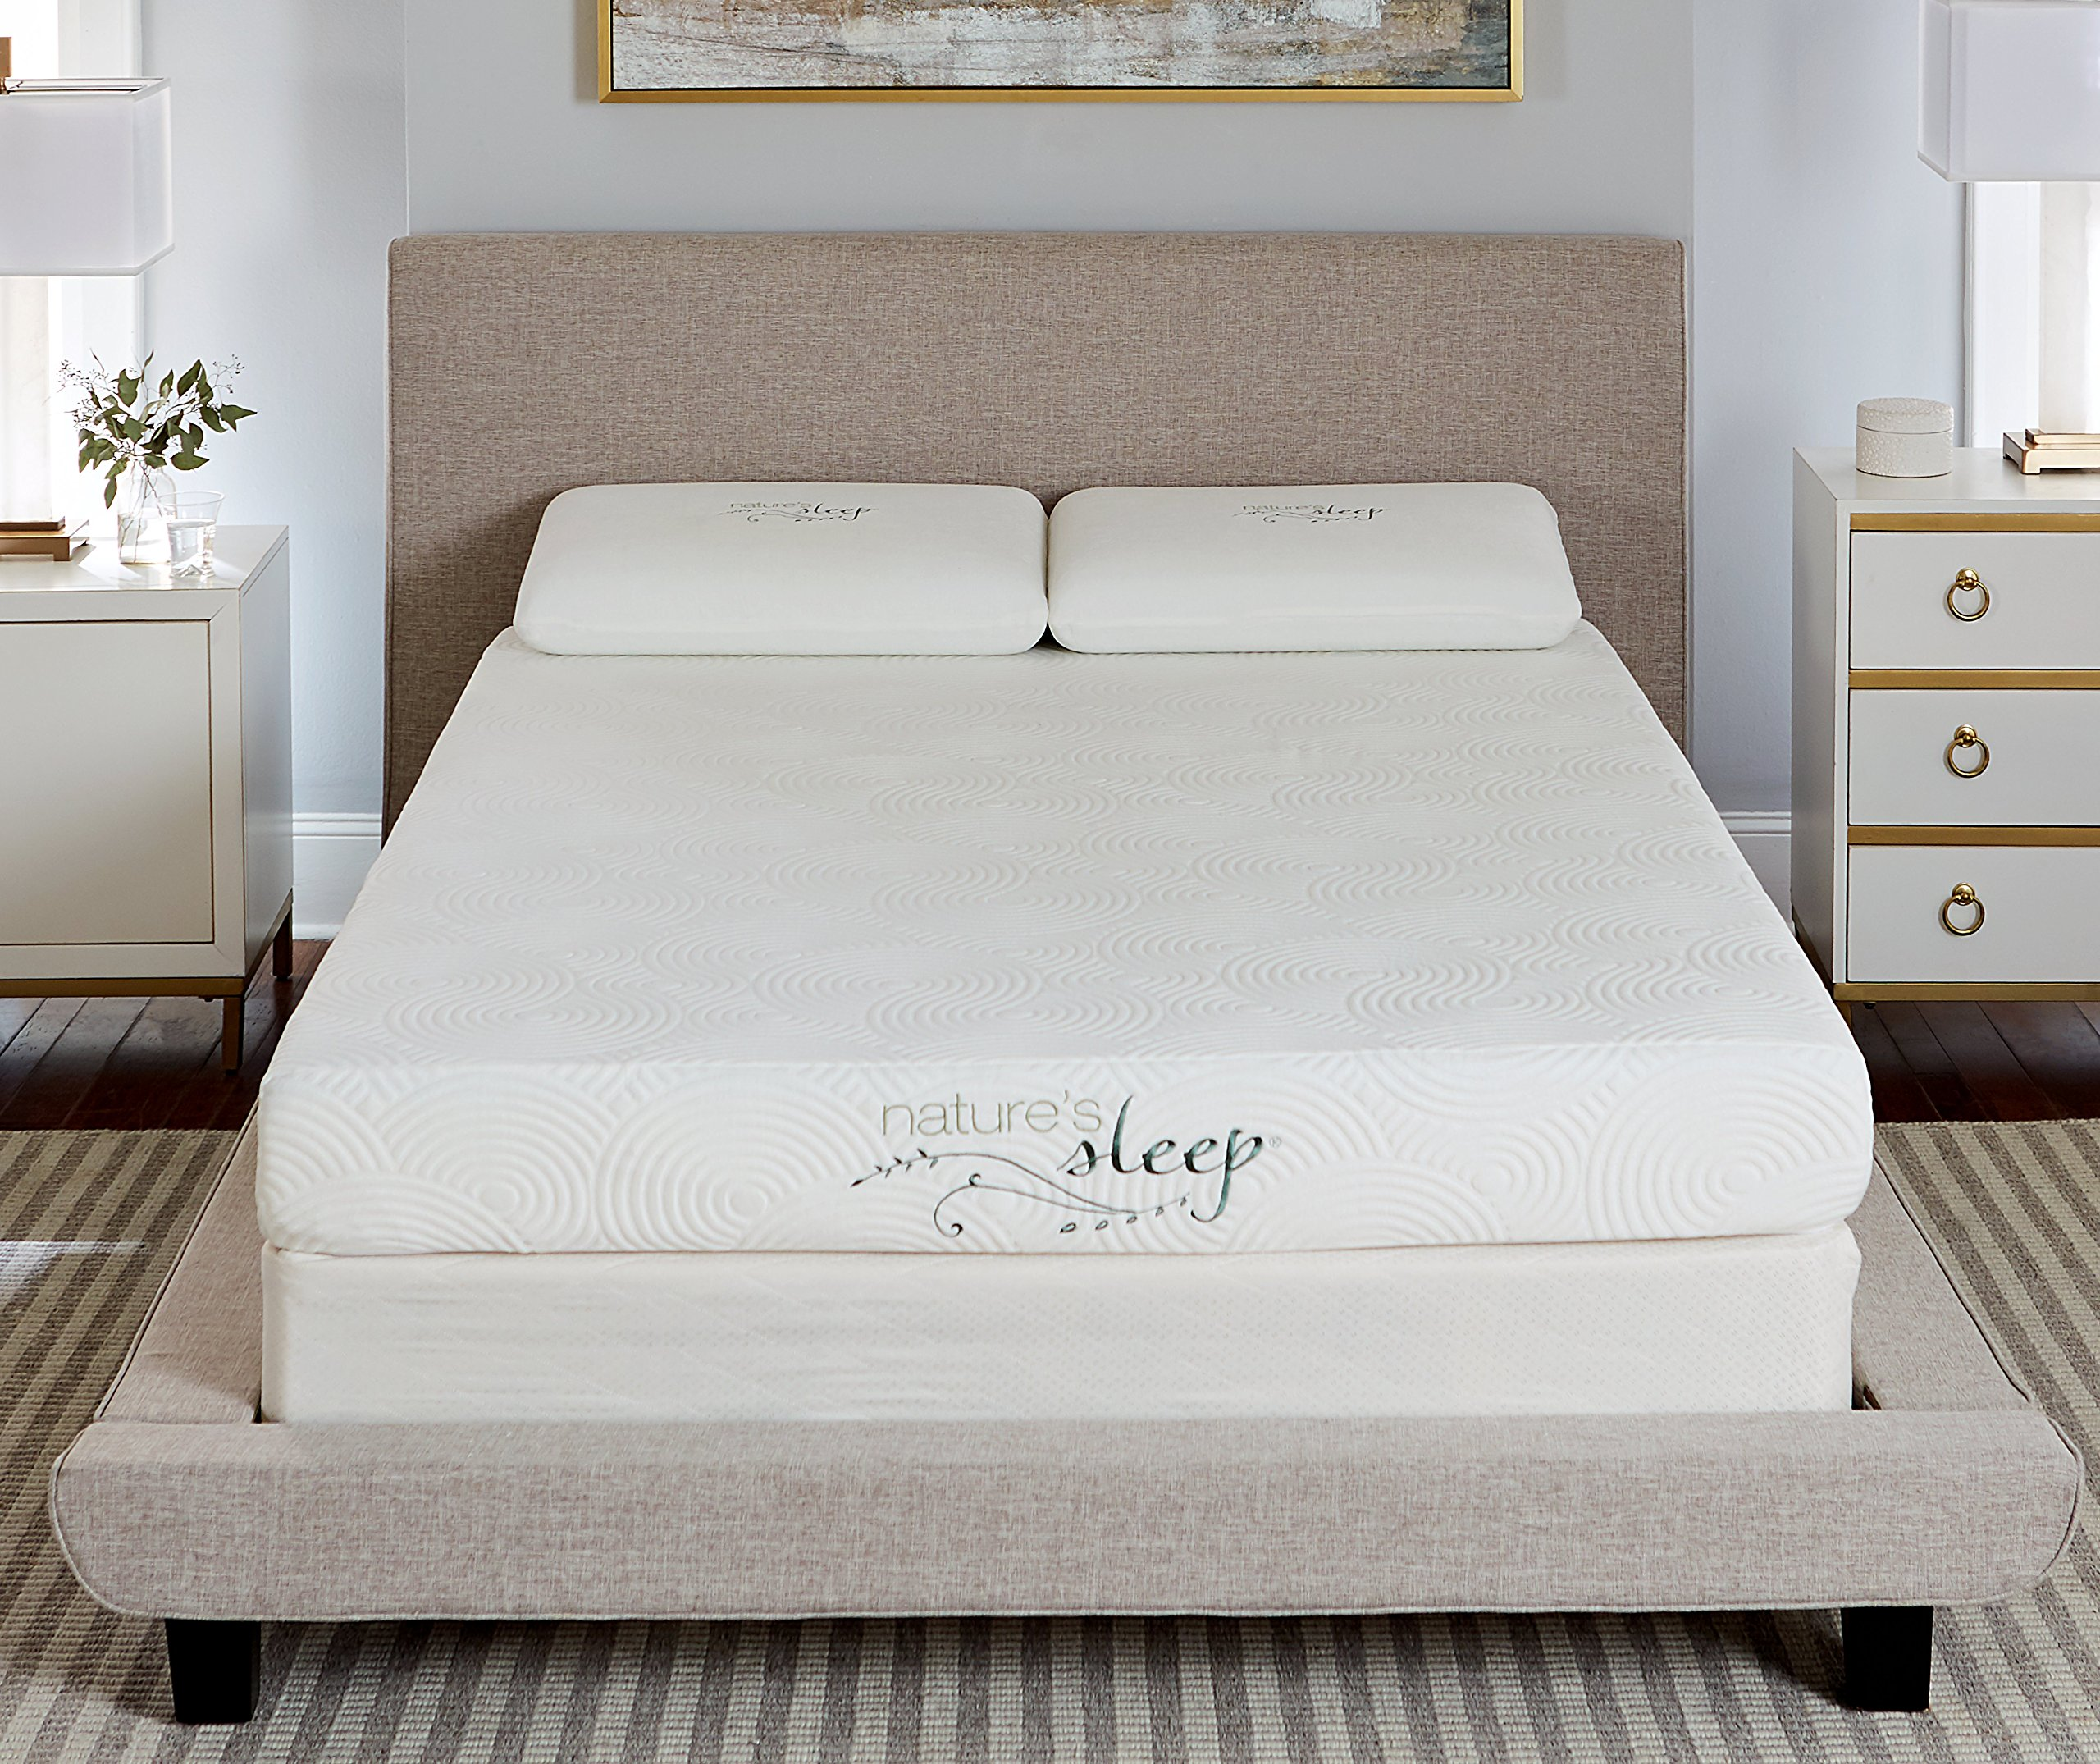 "Nature's Sleep 800LP350 8"" Gel Memory Foam Mattress, Queen"